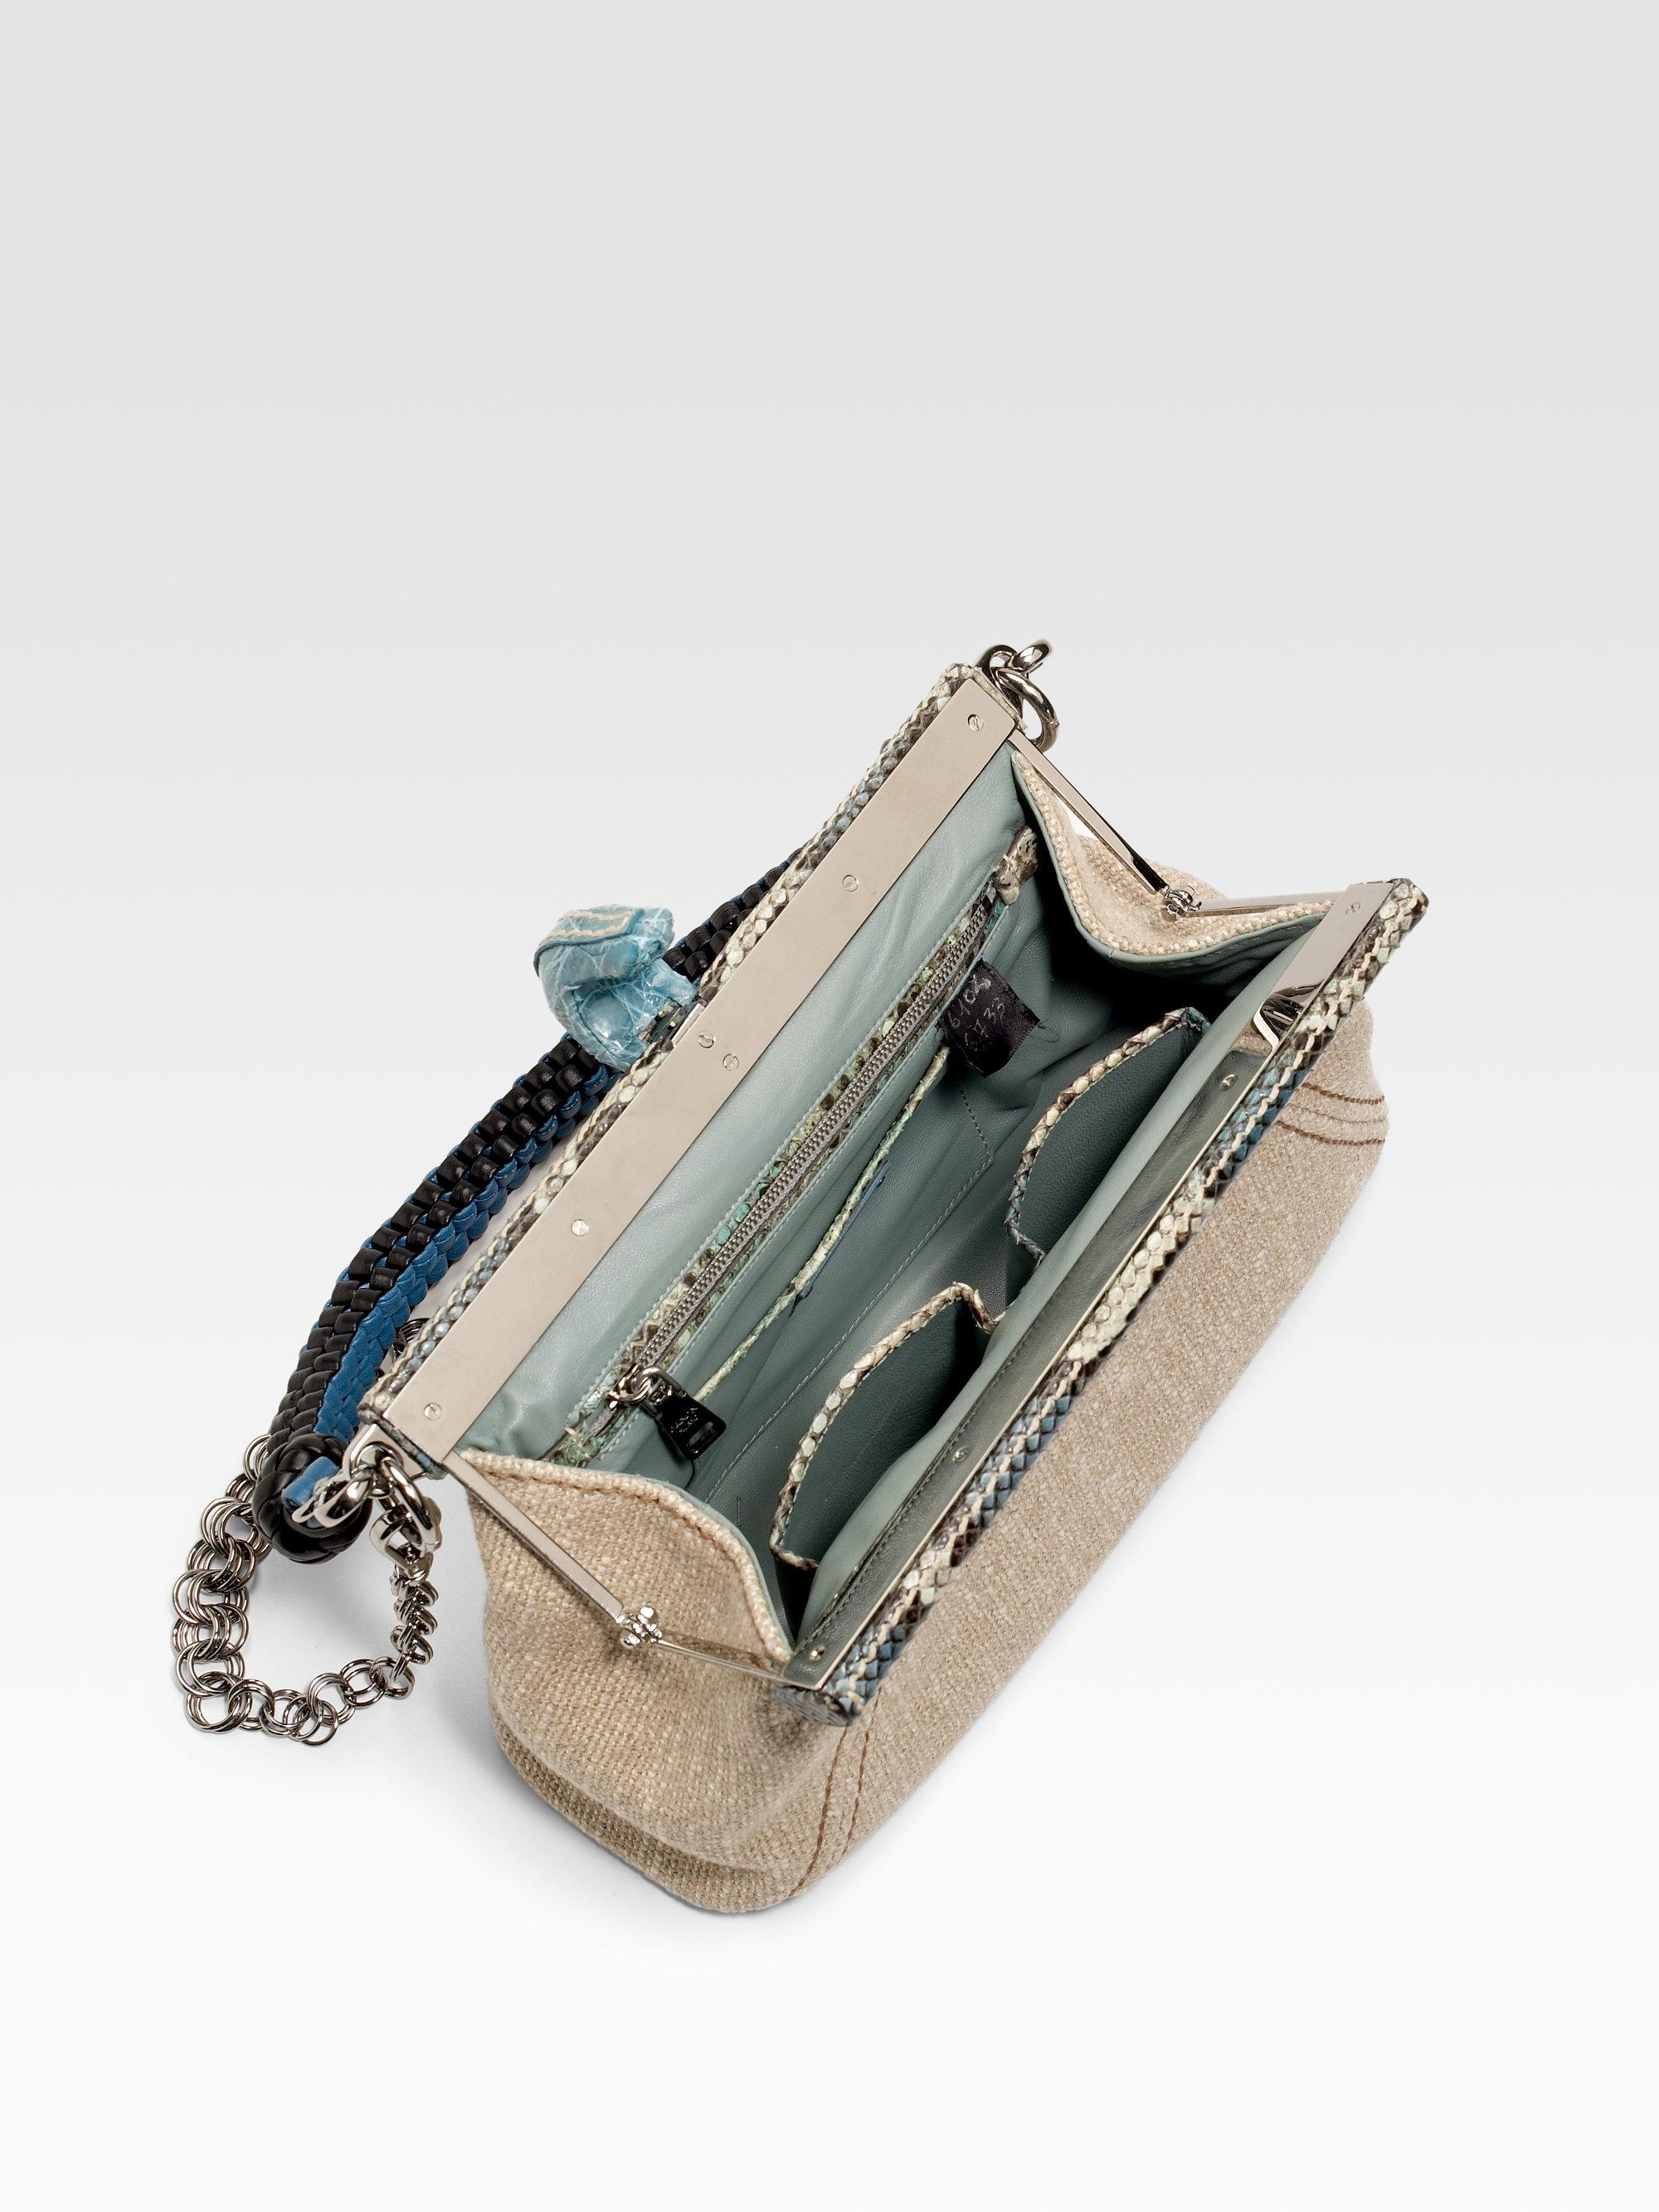 prada ostrich bag price - Prada Frame python and crocodile leather bag